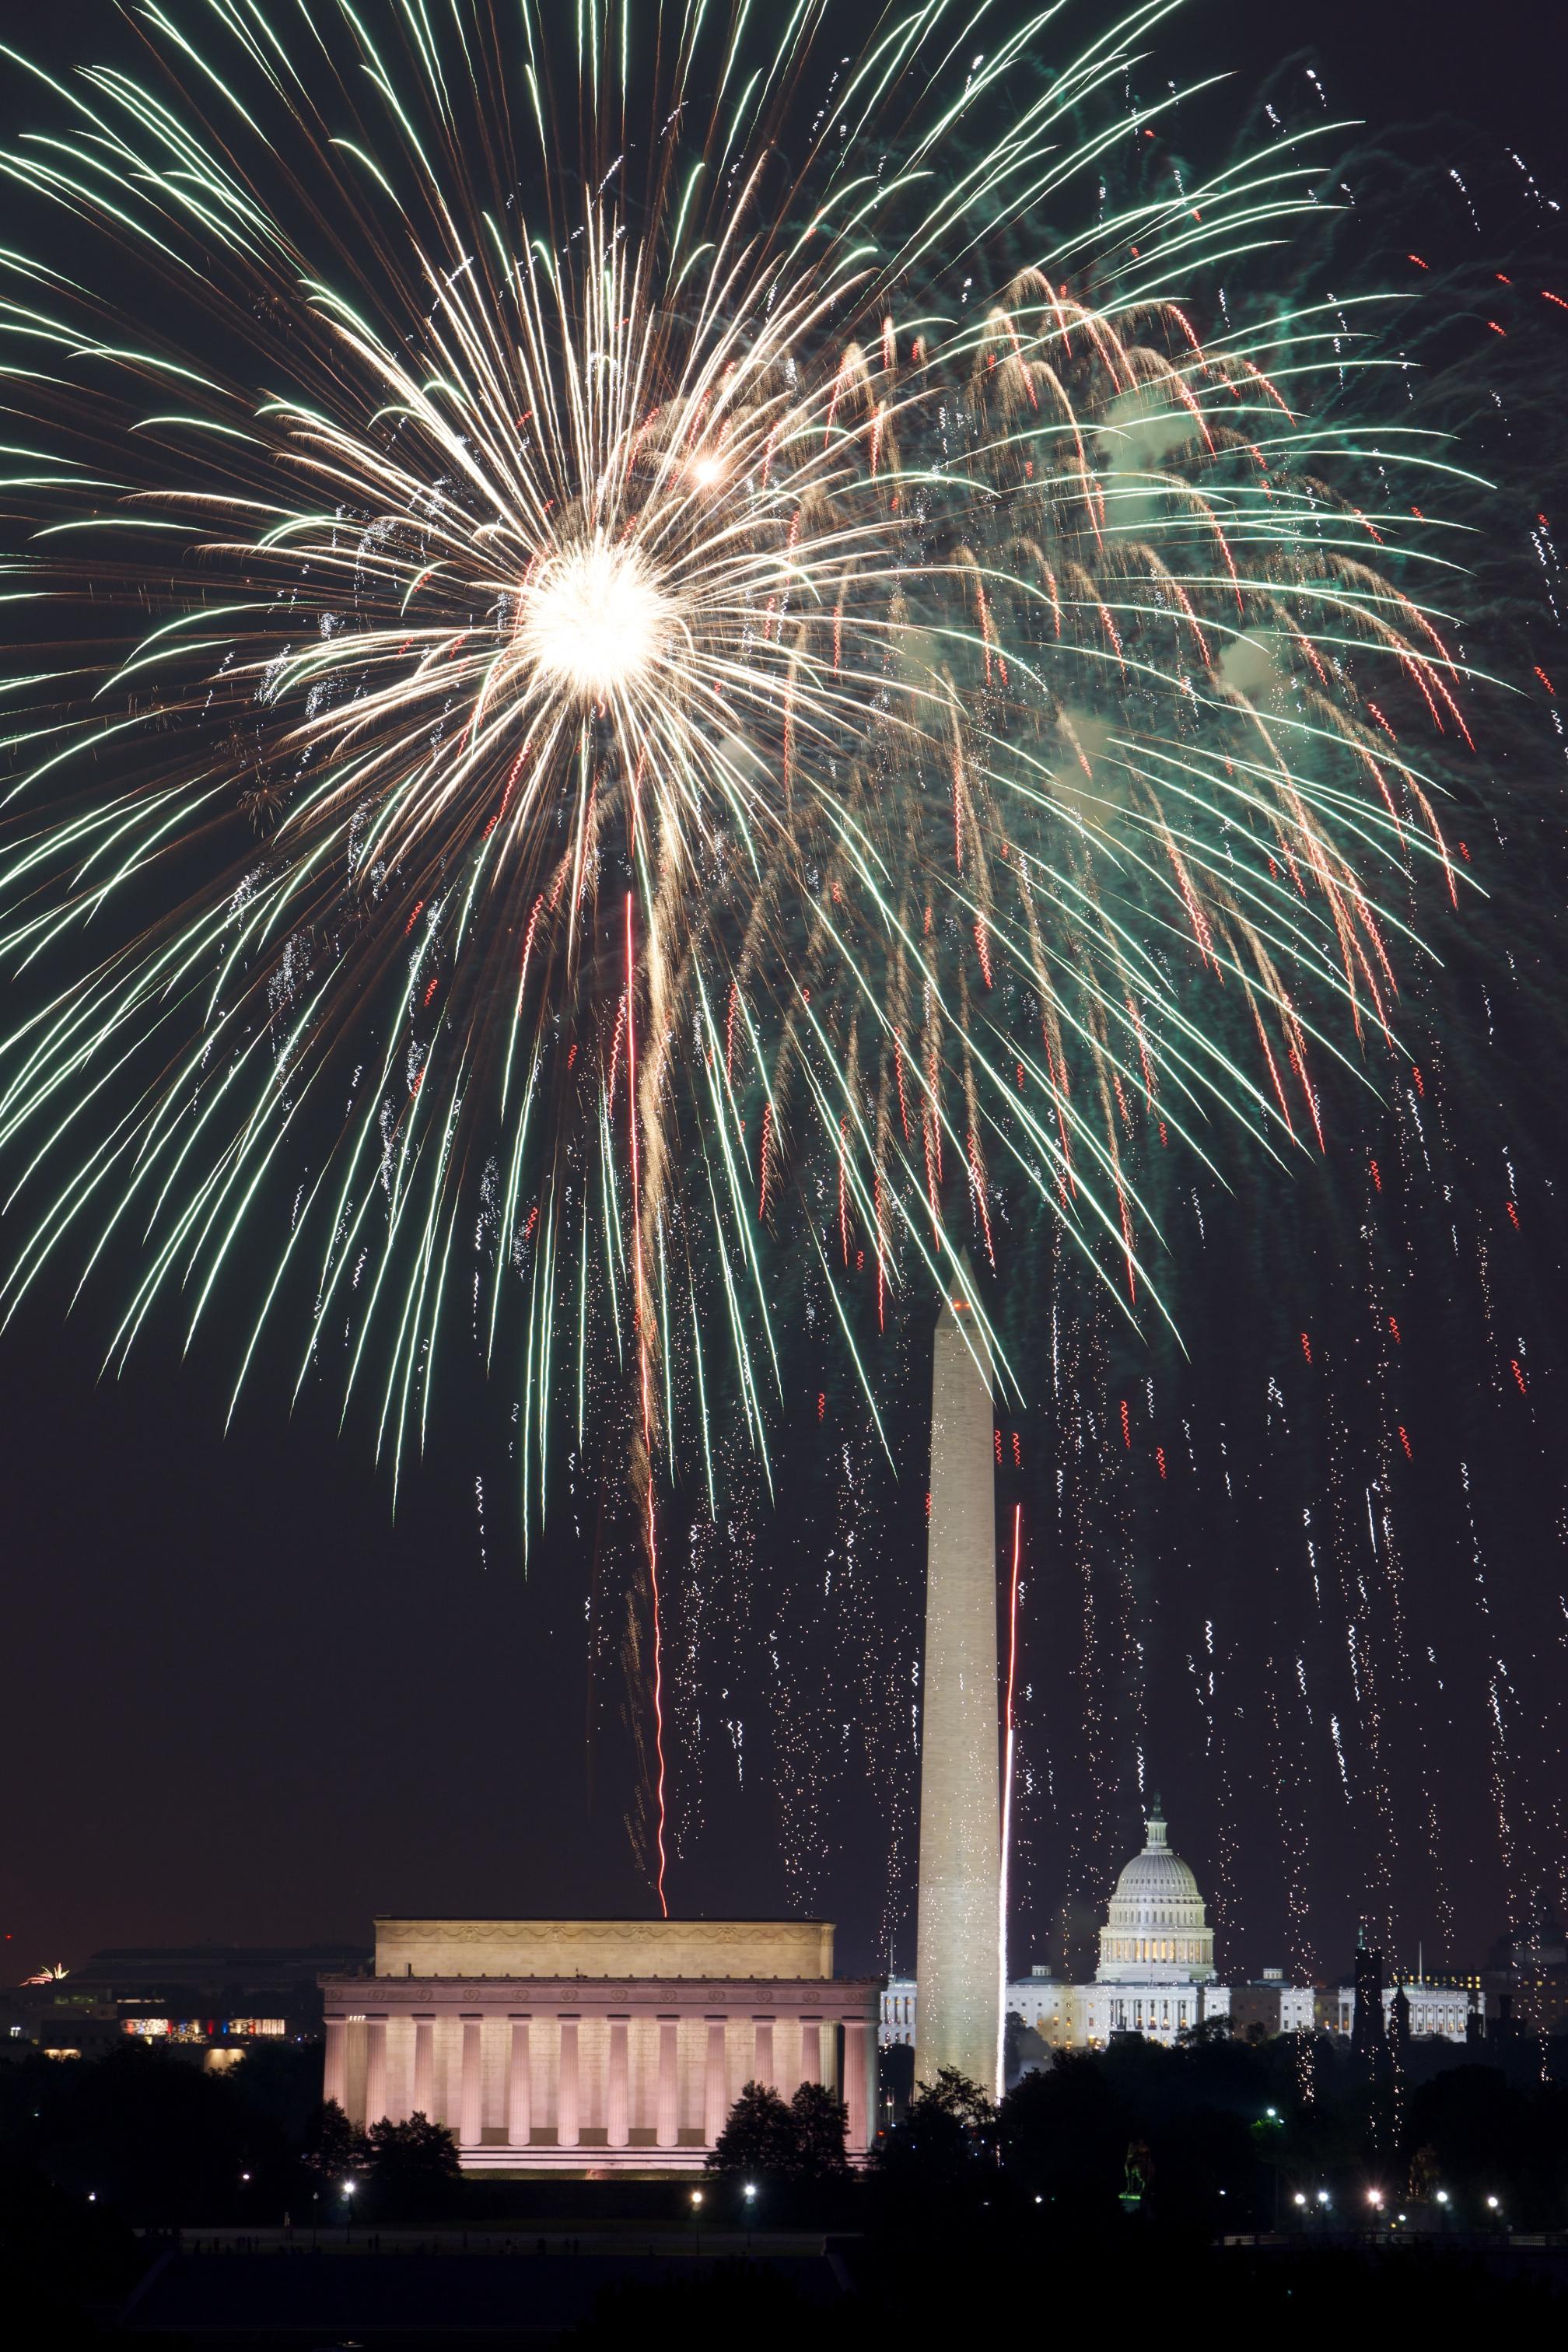 DC-Fireworks-_DSC5543.ARW2011-07-04.jpg